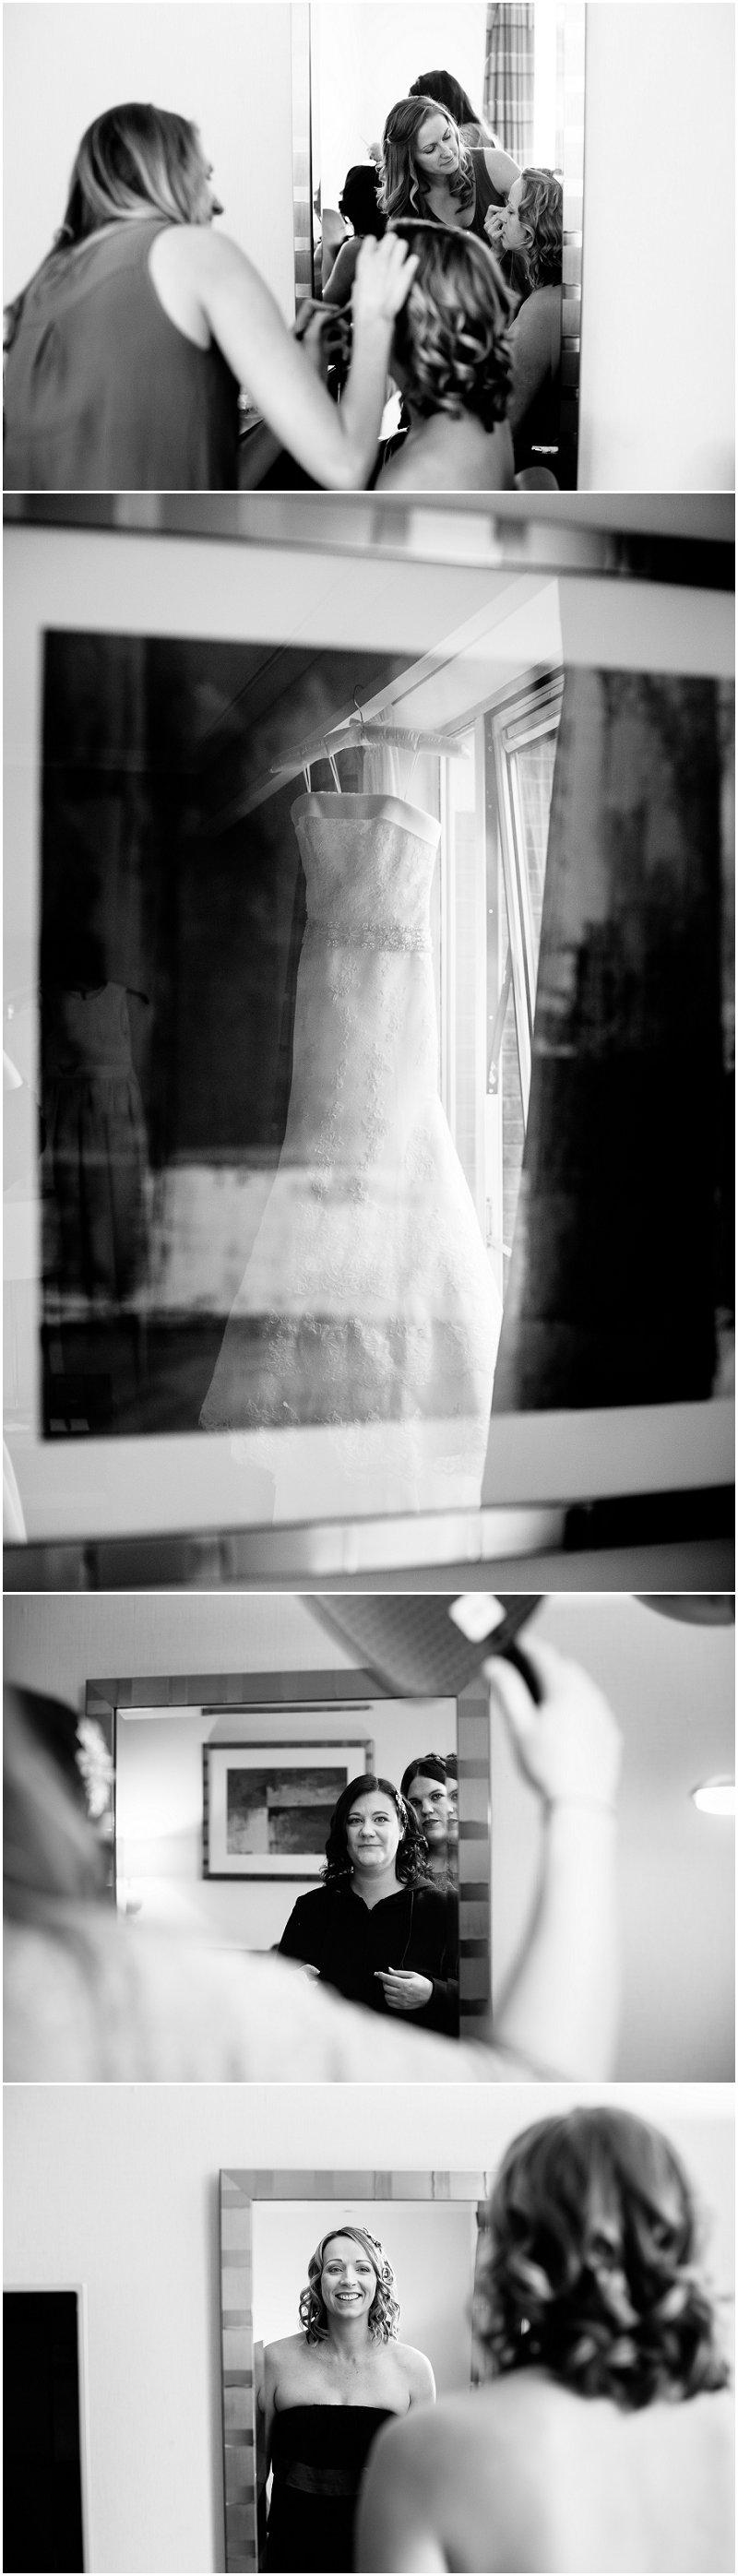 Hilton Wedding Photography | Kent Wedding Photographer